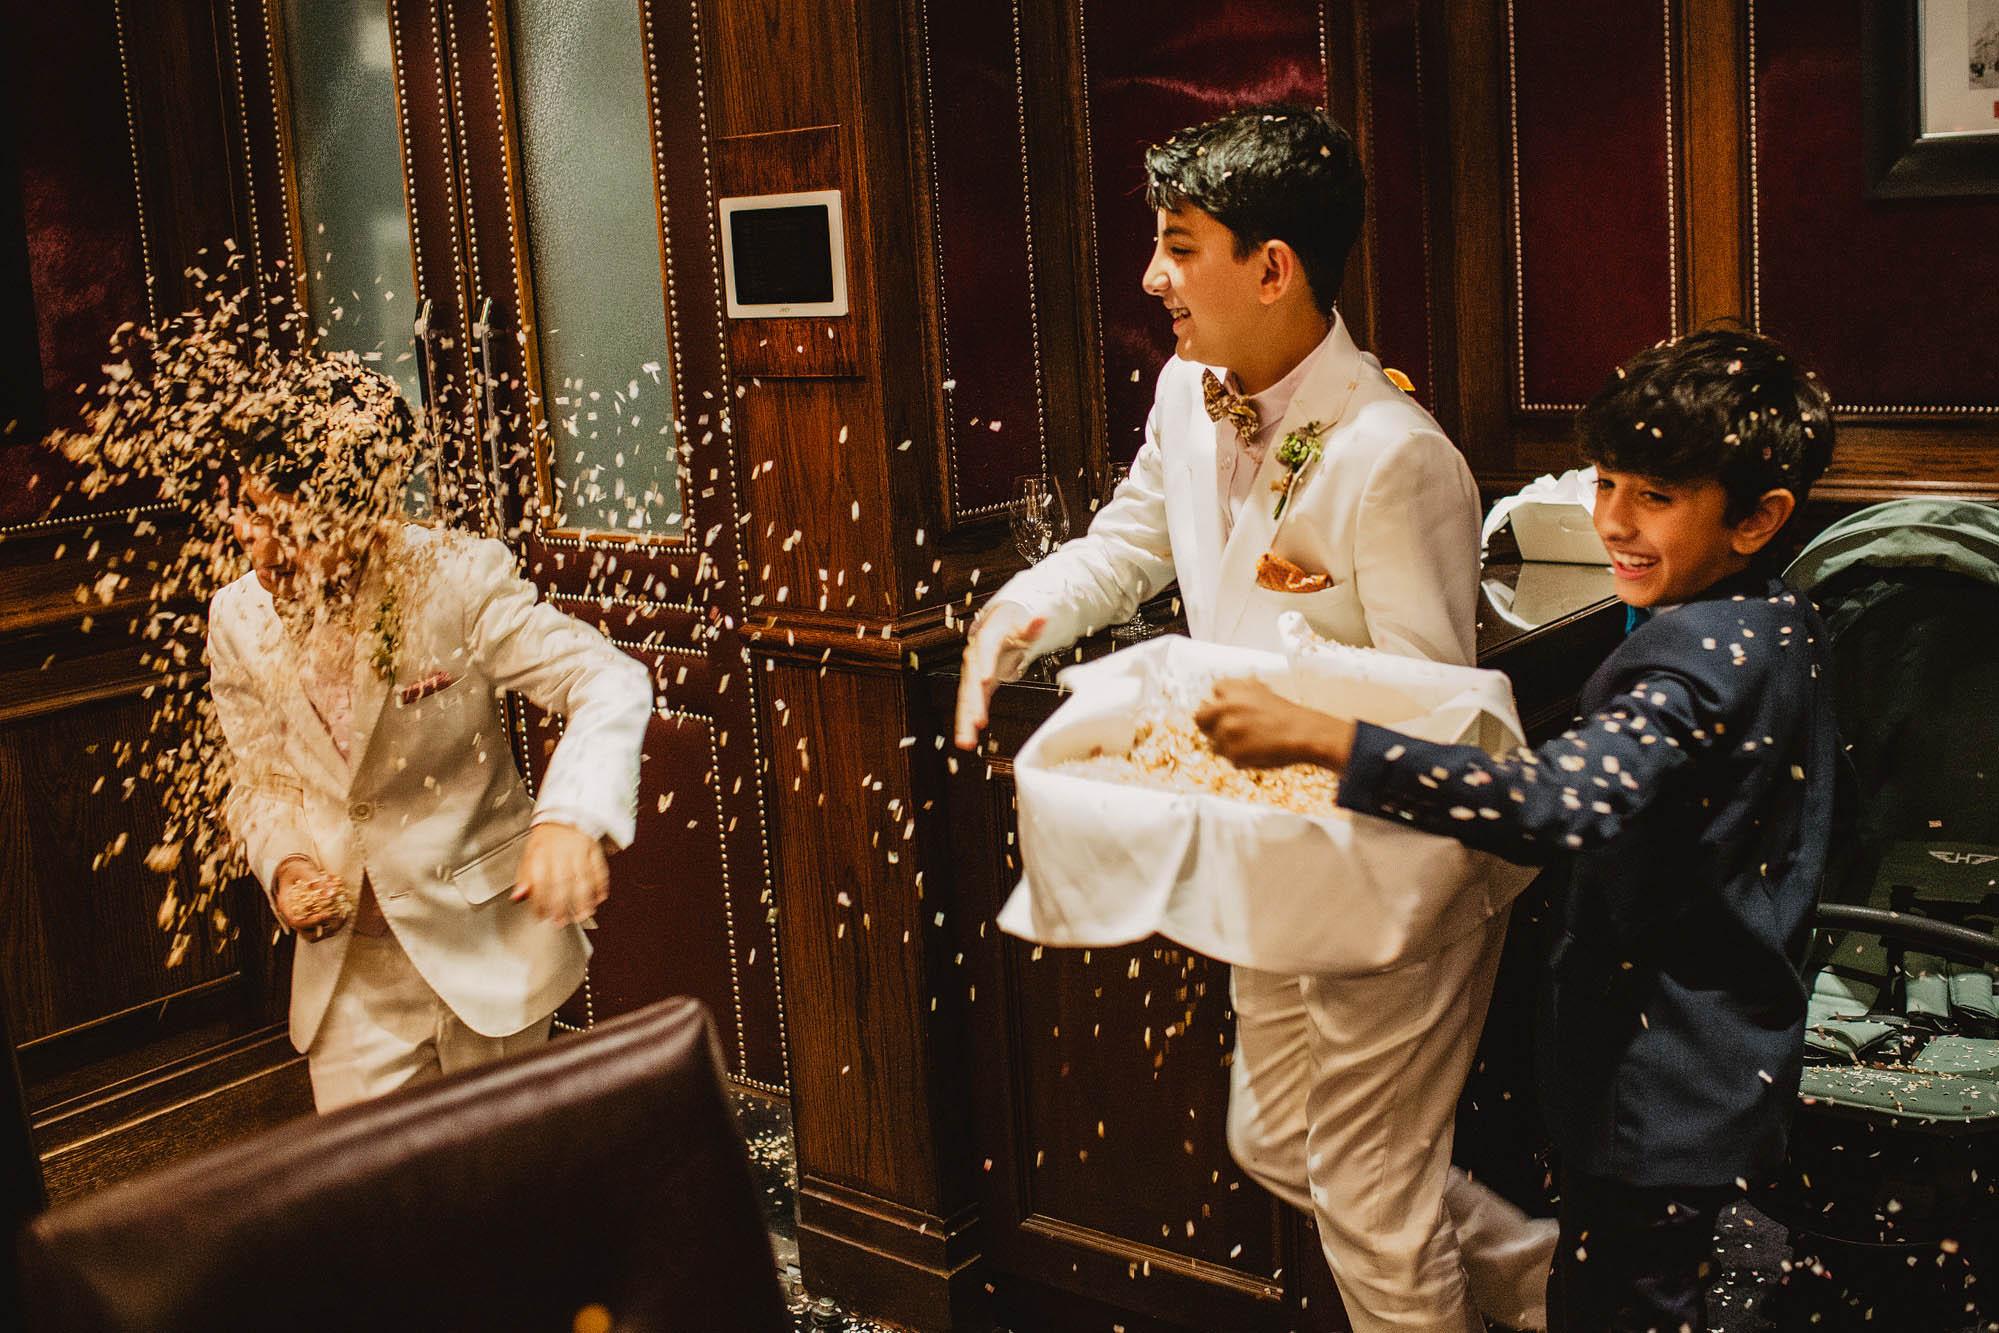 Goring hotel London wedding